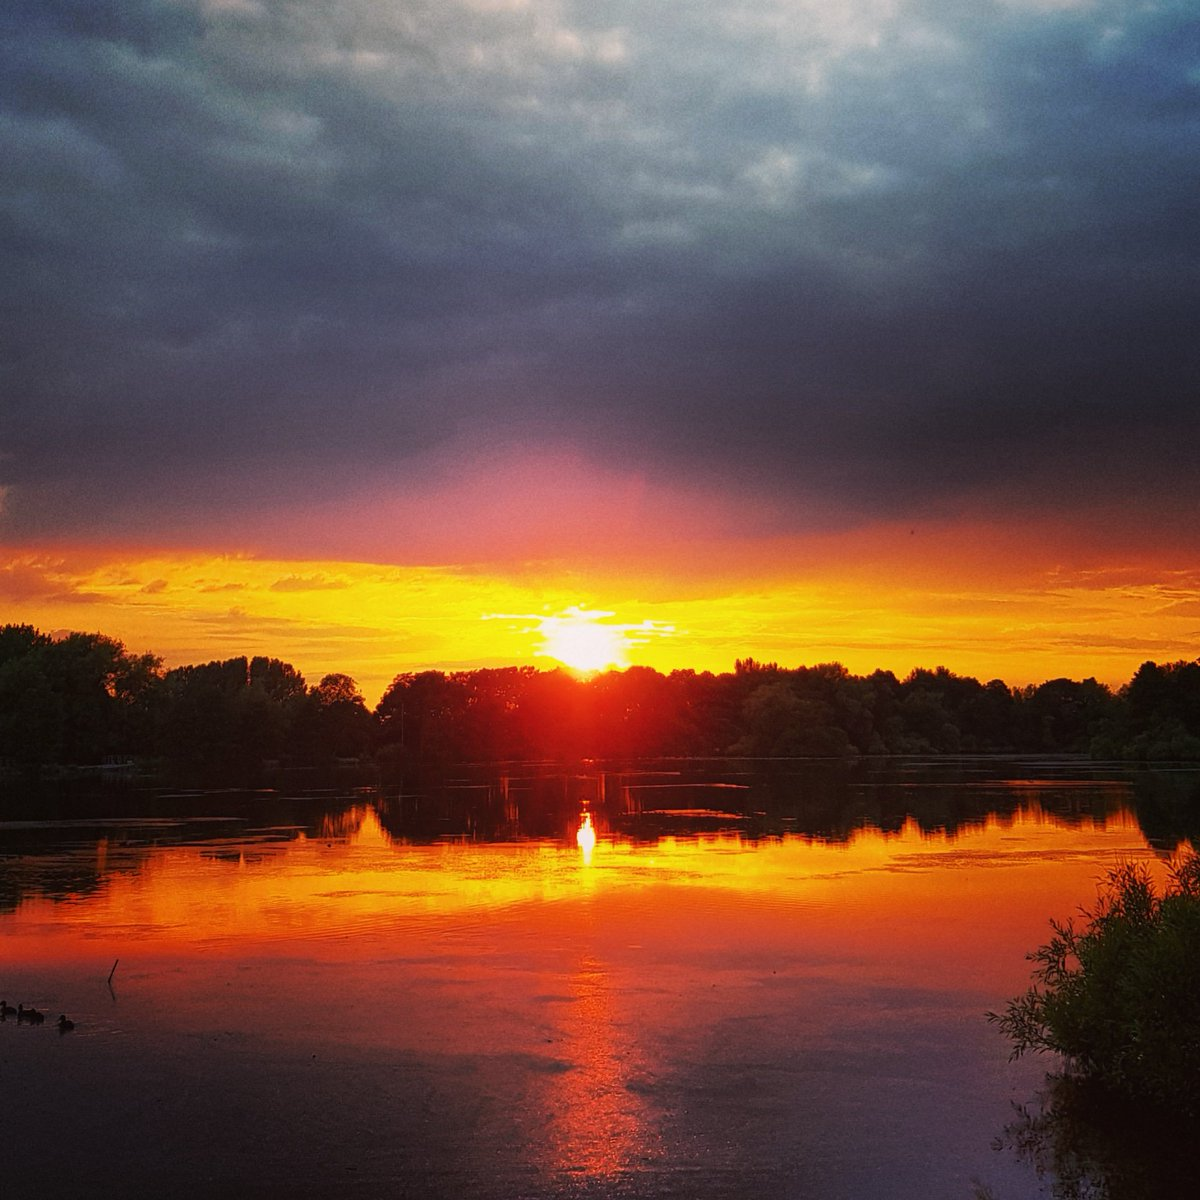 Alderley Park Mere and Stanley Monument sunset @AlderleyPark #stormhour #Sunset #sunsets<br>http://pic.twitter.com/dEBoeRZL9V